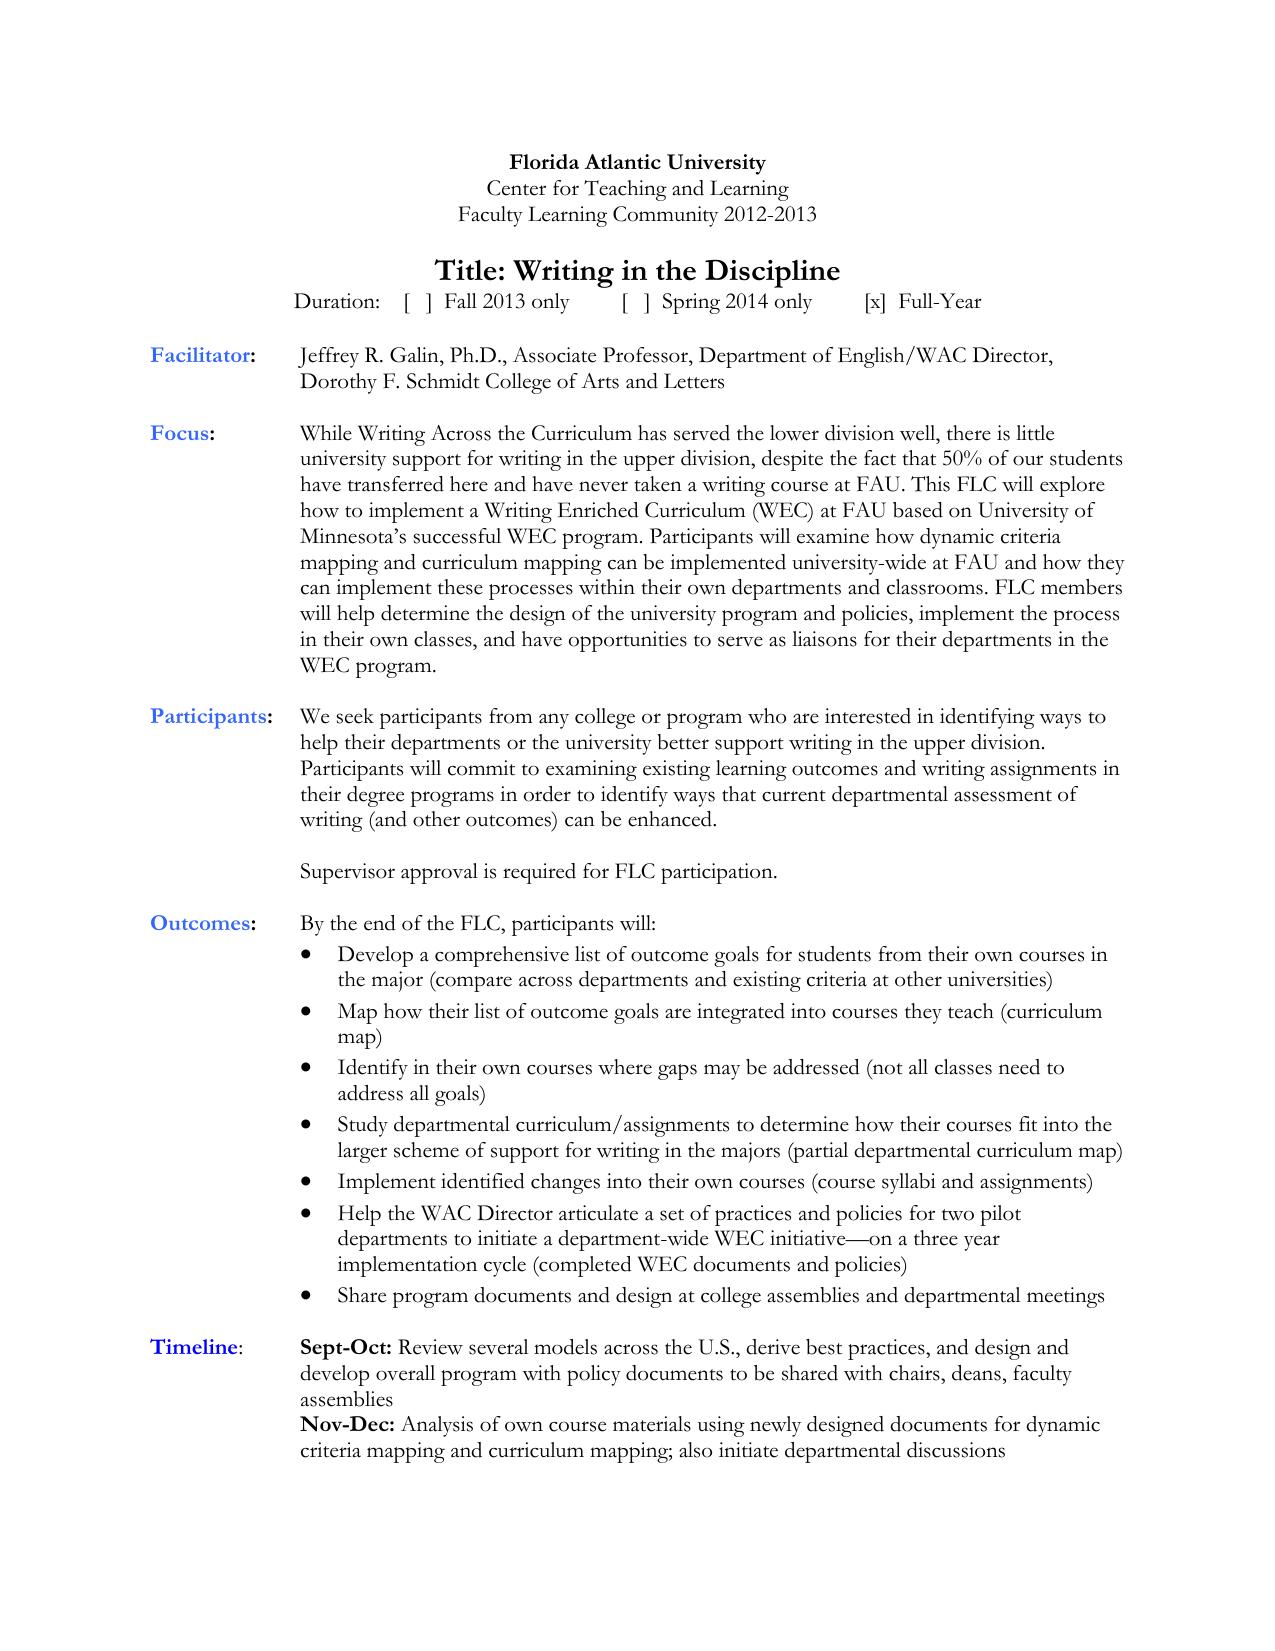 samples college essay explaining bad grades